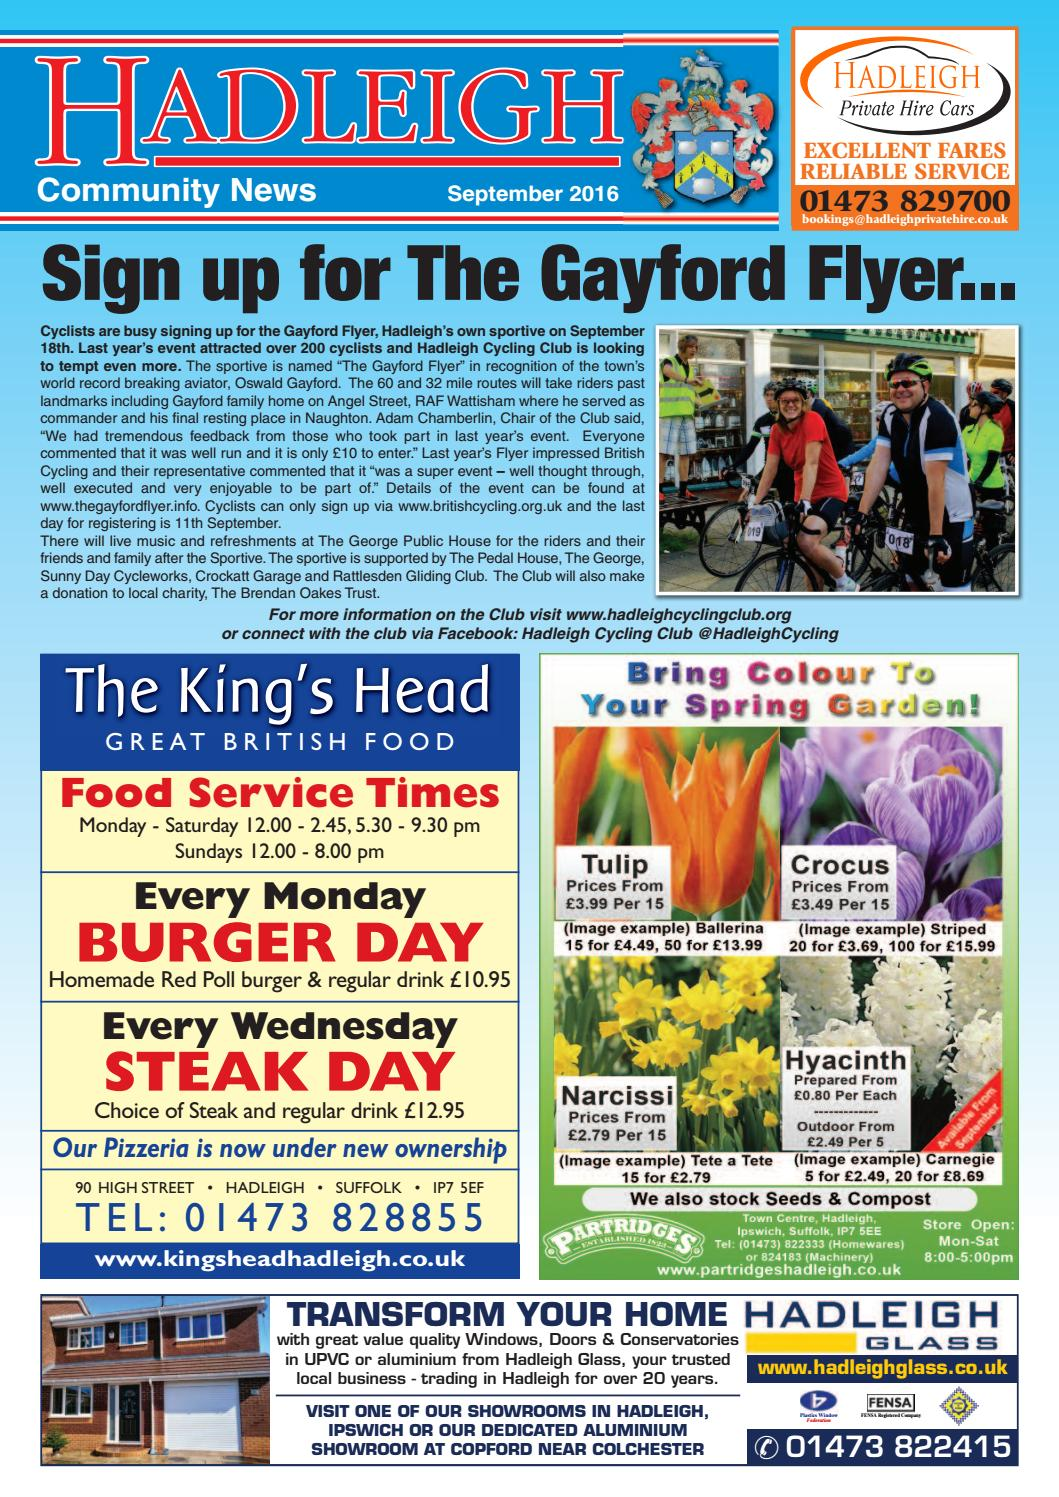 Hadleigh Community News, September 2016 by Keith Avis Printers - issuu